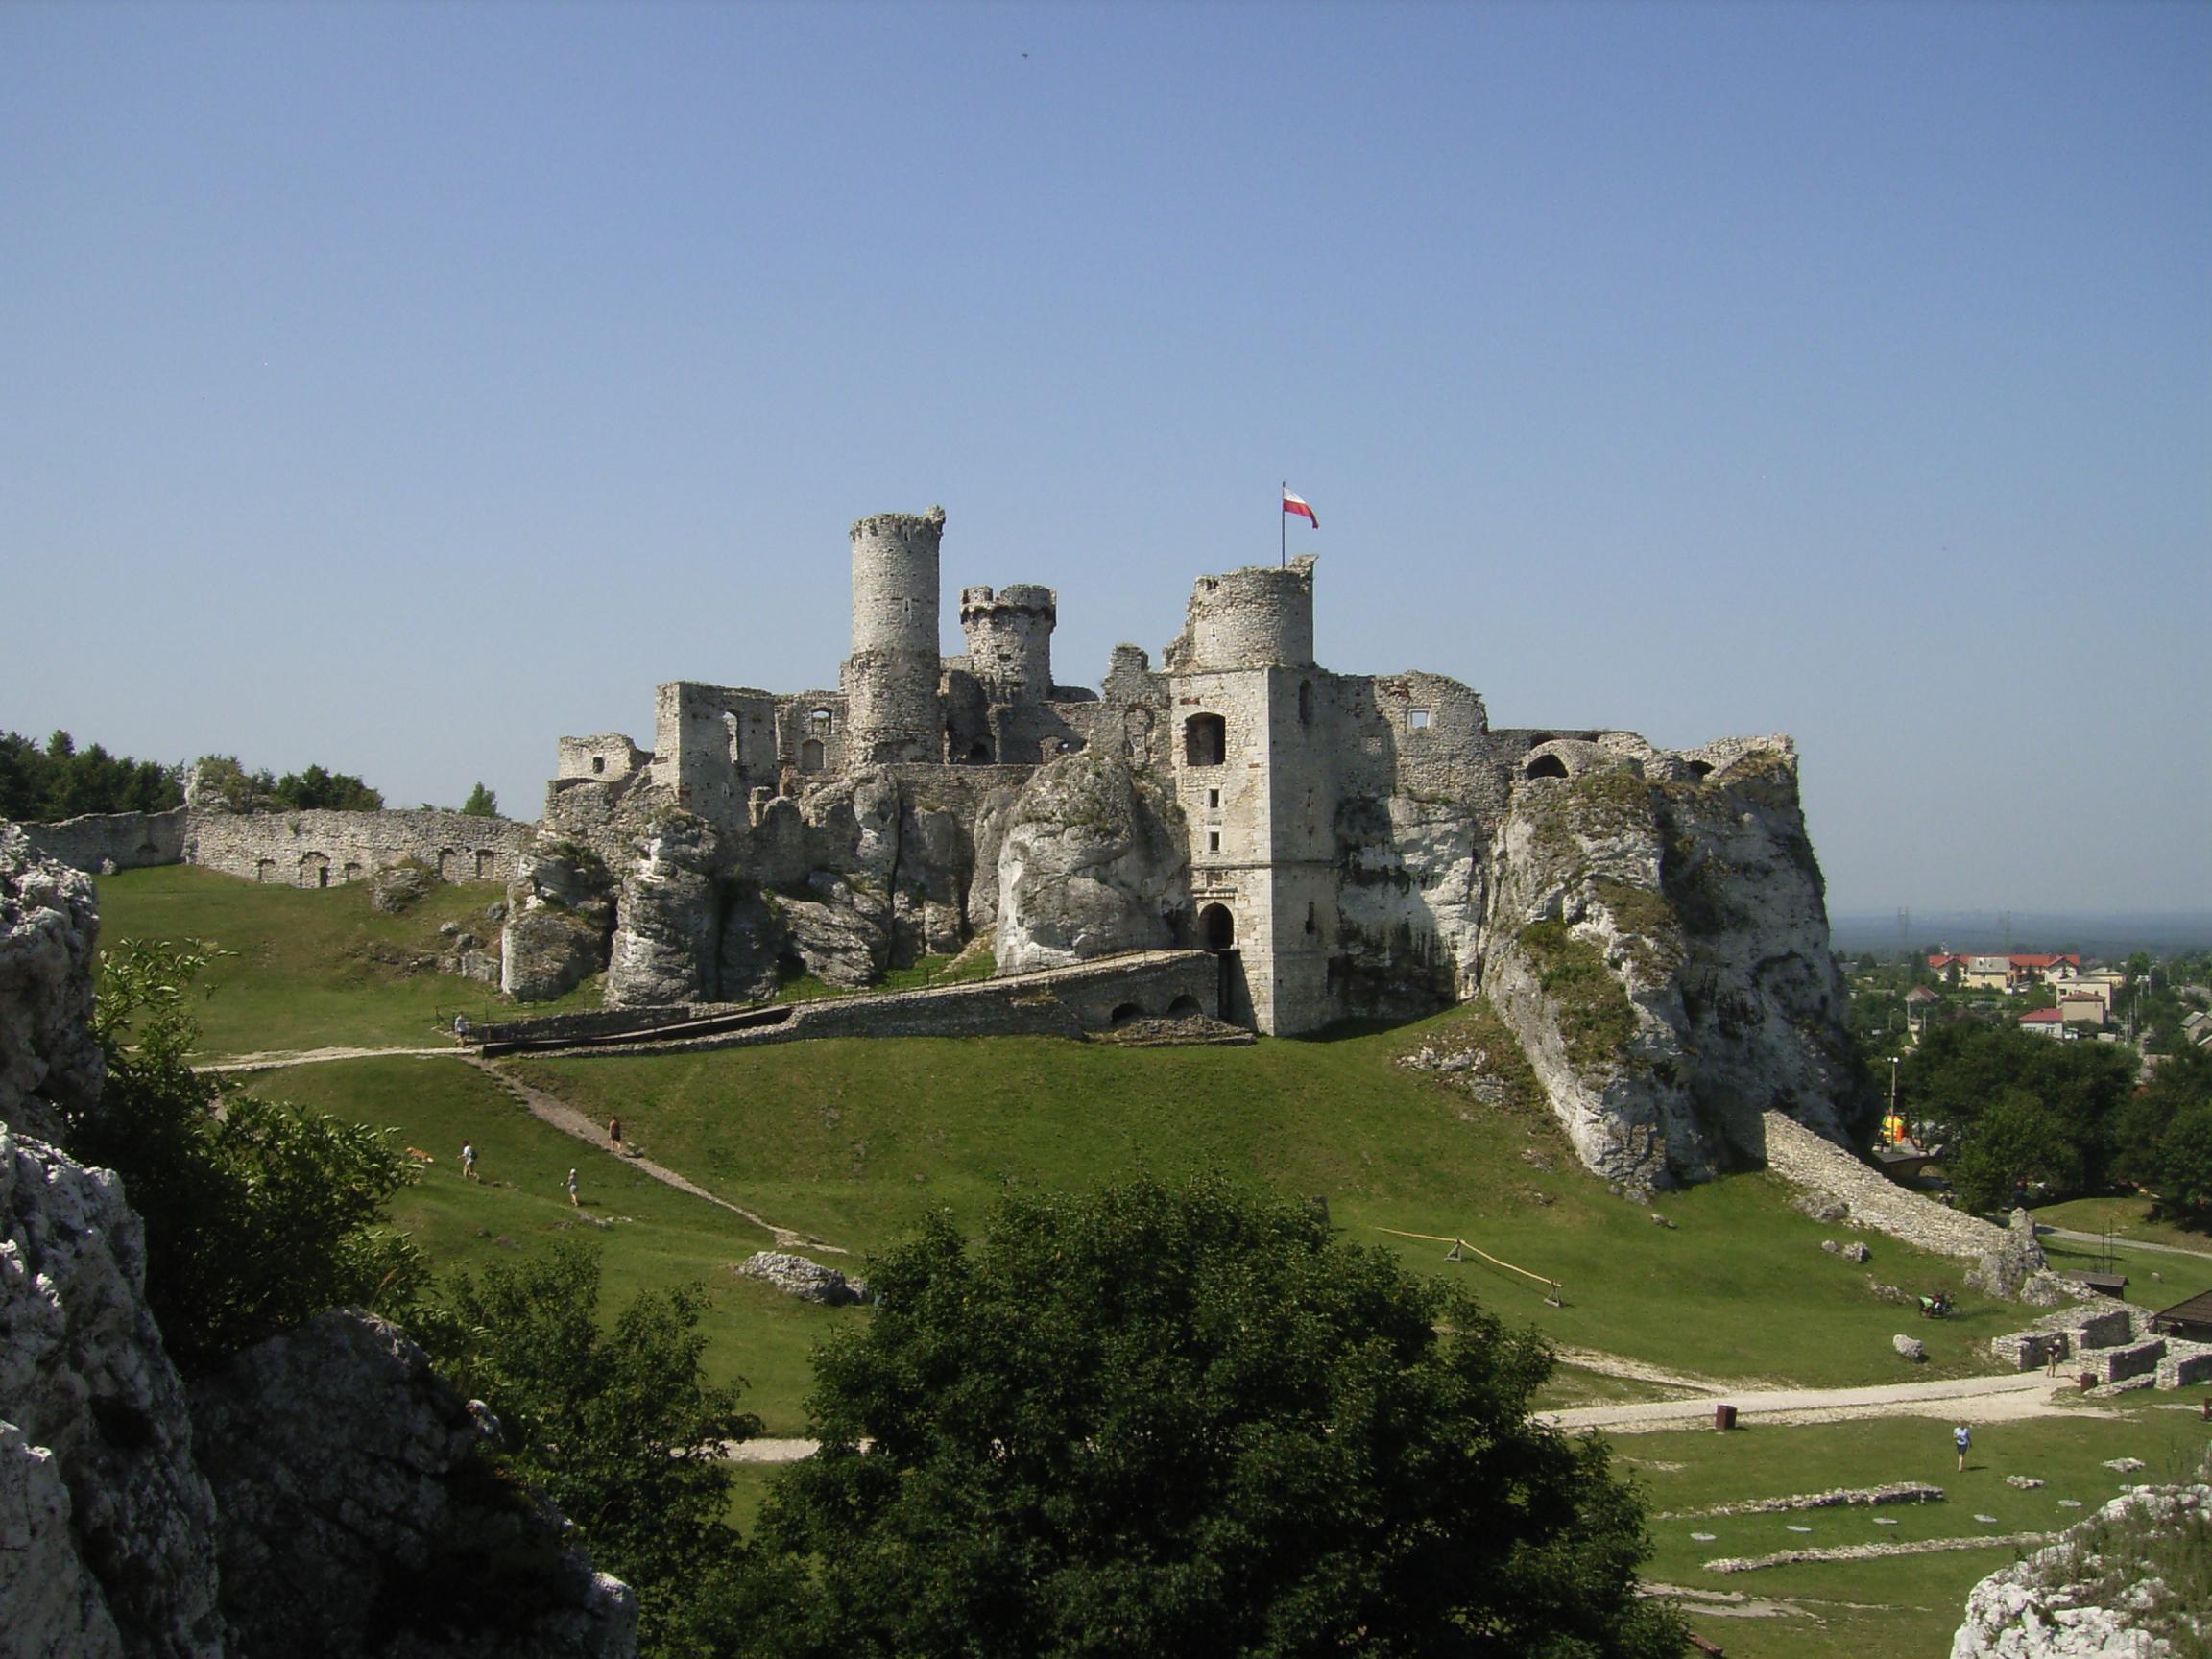 オグロジェニエツ城 / Zamek Ogrodzieniec (TBS)